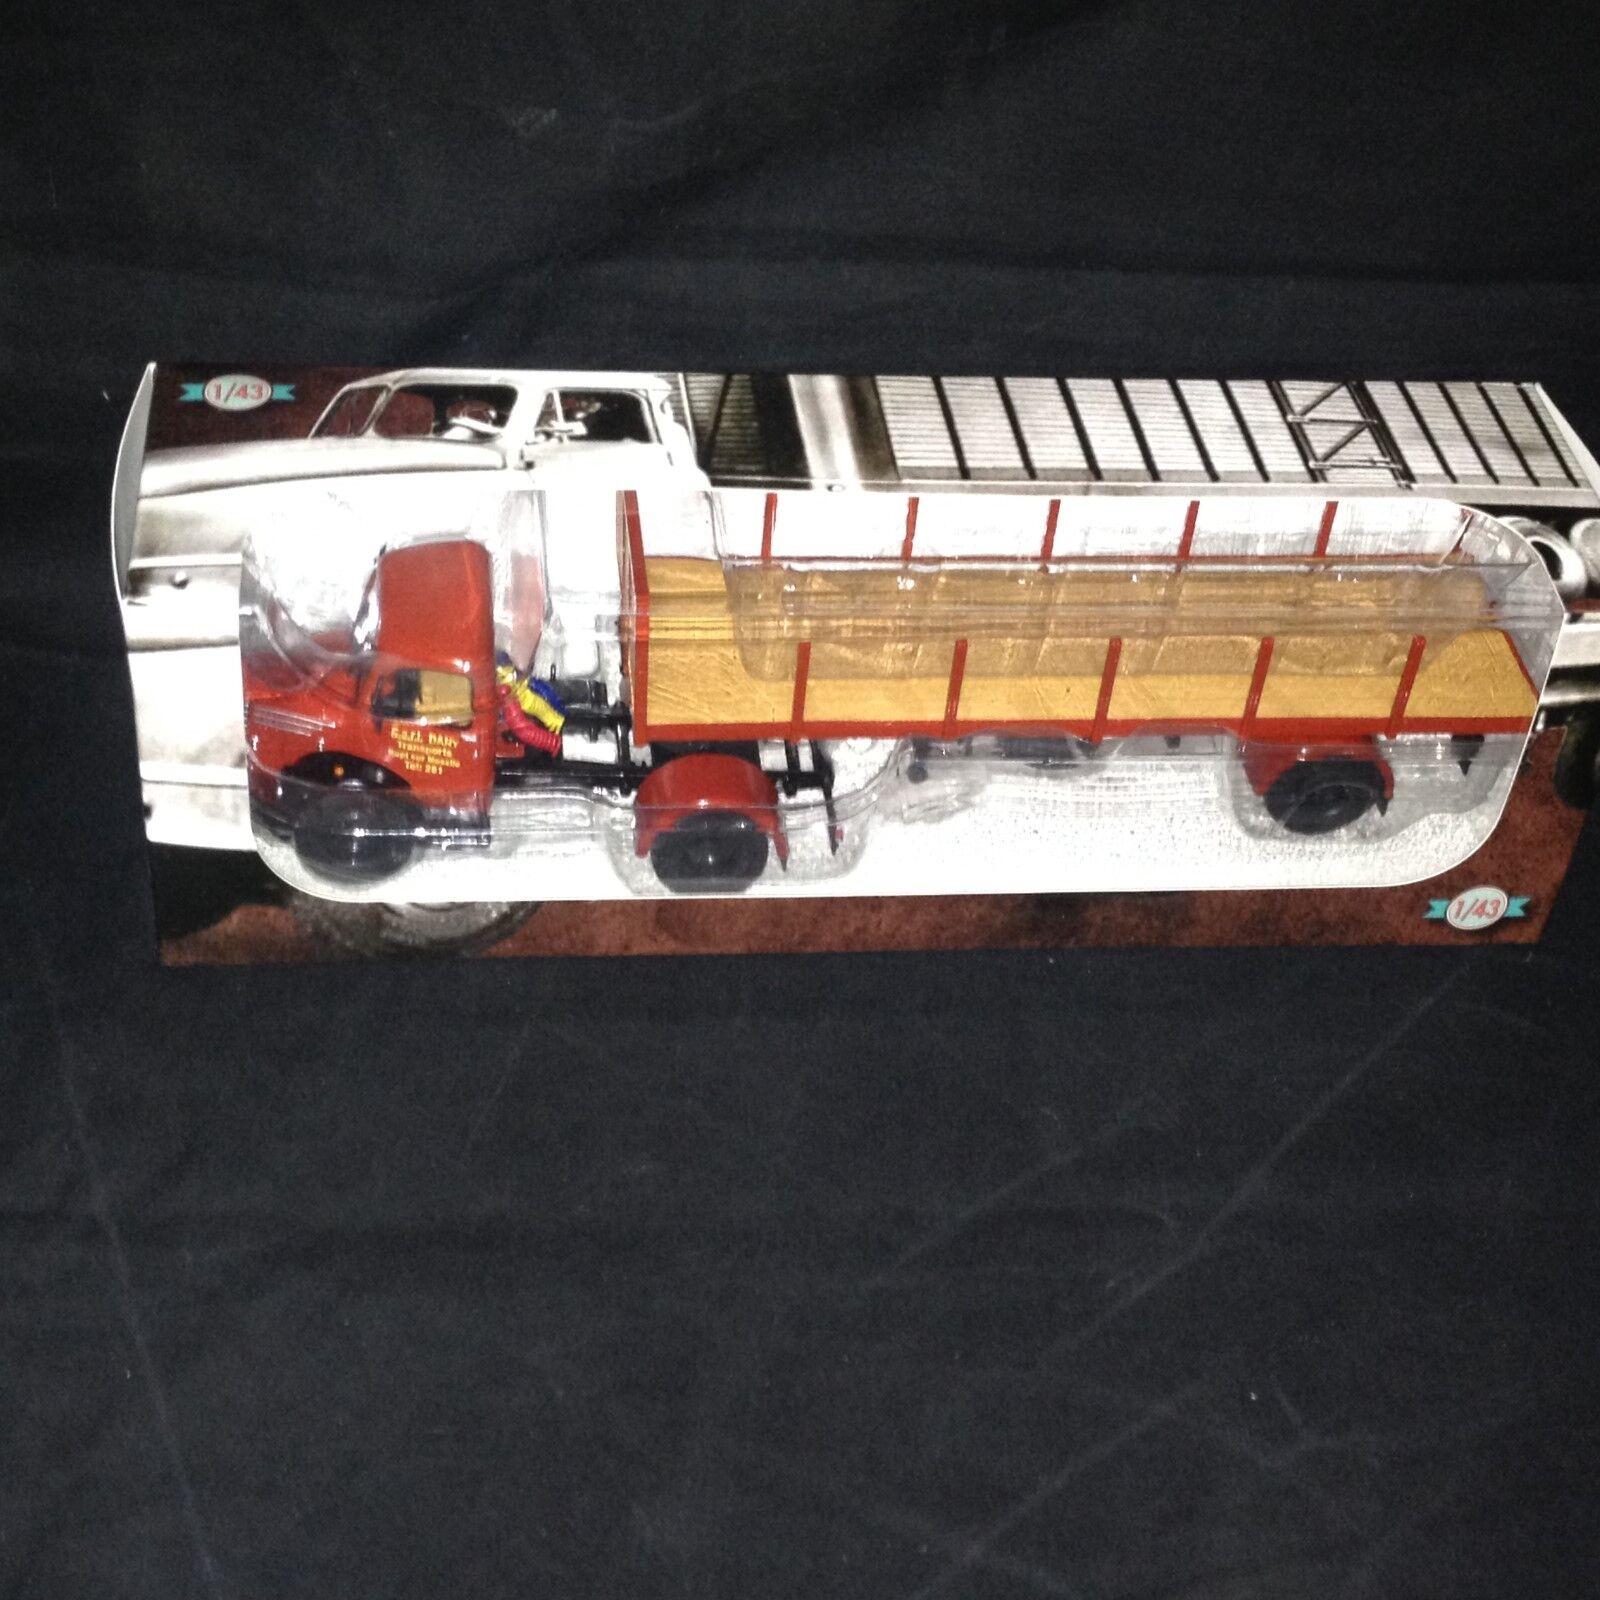 Truck unic zu 42t dany transport-ixo altaya 1 43 truck trailer (eb37)